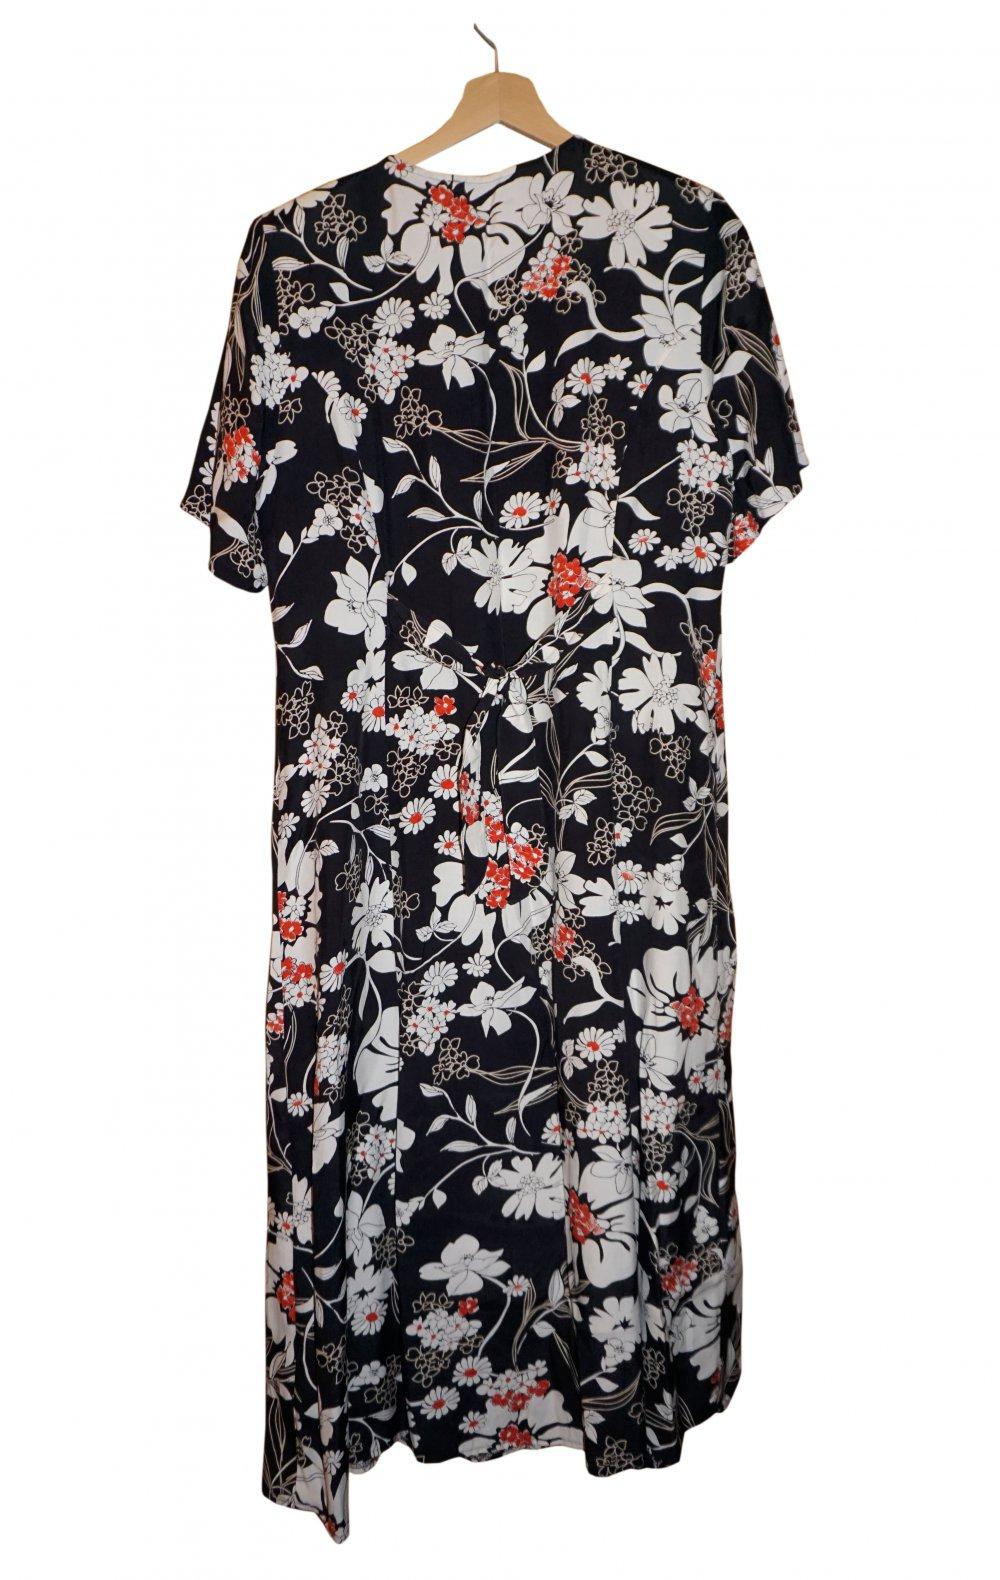 1d8fdc48305402 Greenfield Damen Kleid Sommerkleid Maxikleid Gr. XL 42 :: Kleiderkorb.de